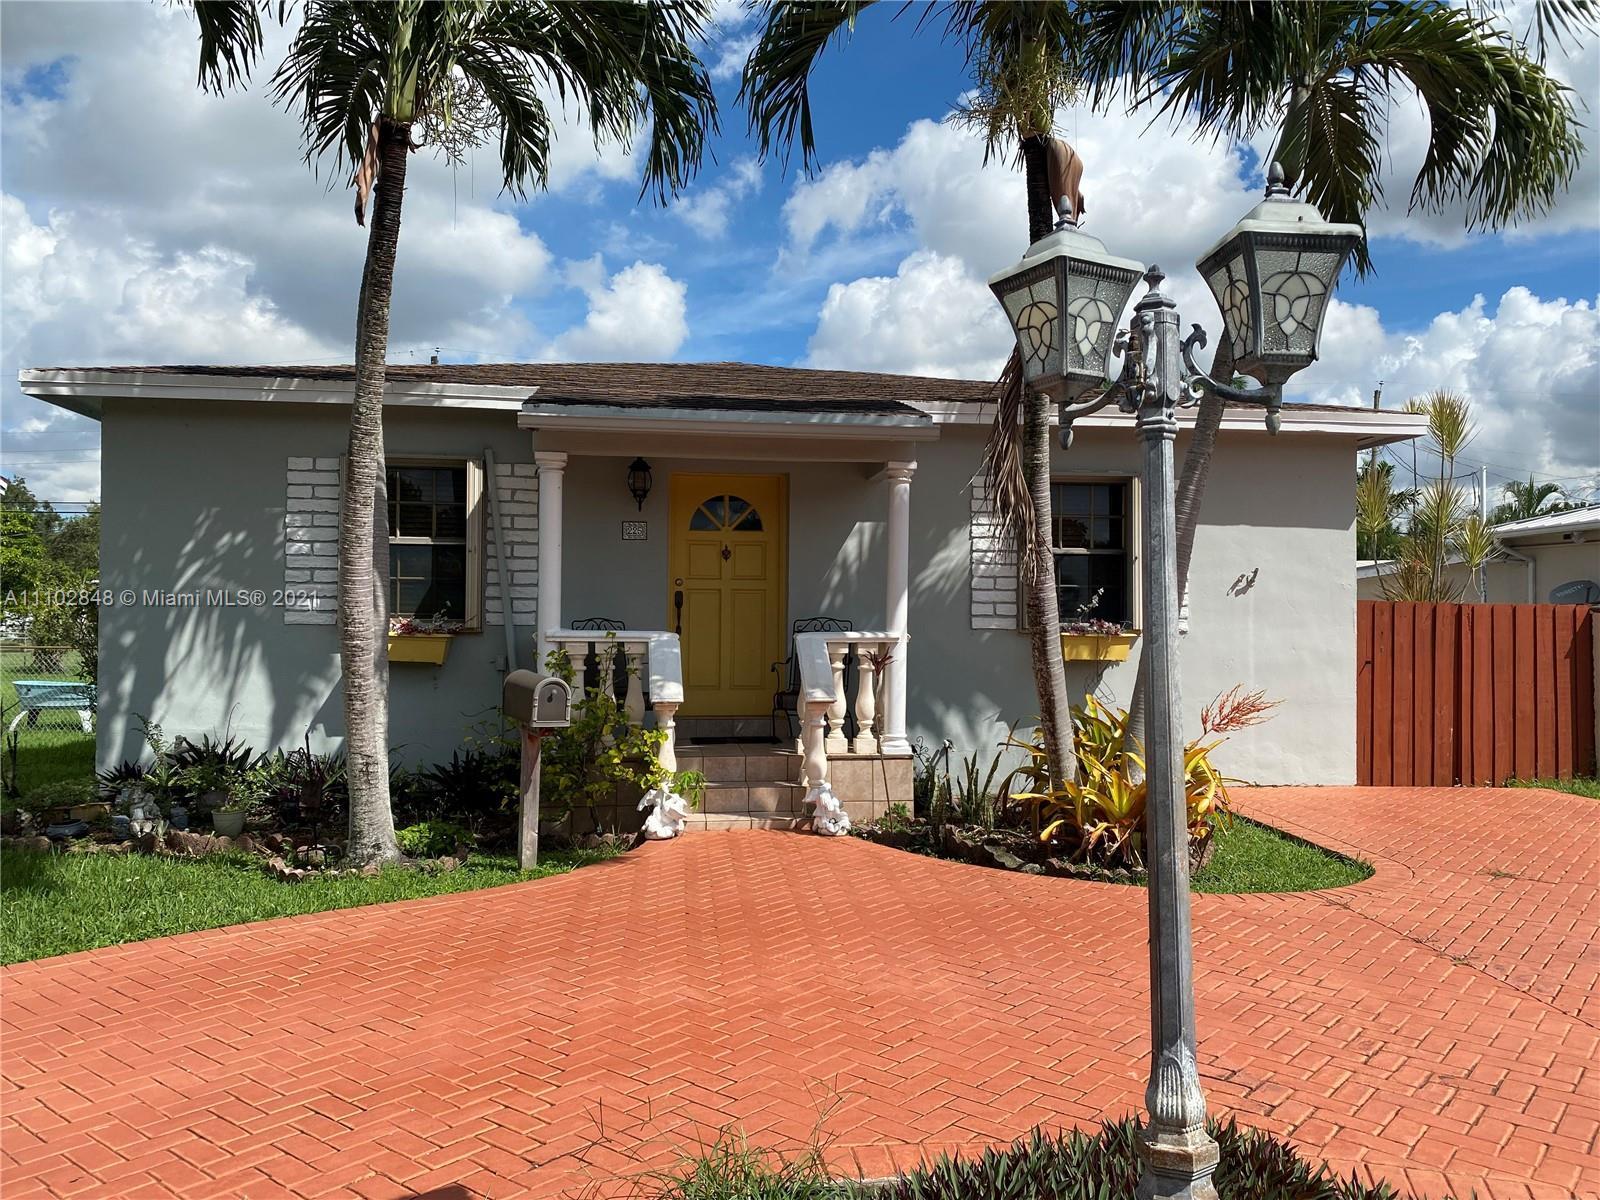 Single Family Home,For Sale,225 Corydon Dr, Miami Springs, Florida 33166,Brickell,realty,broker,condos near me